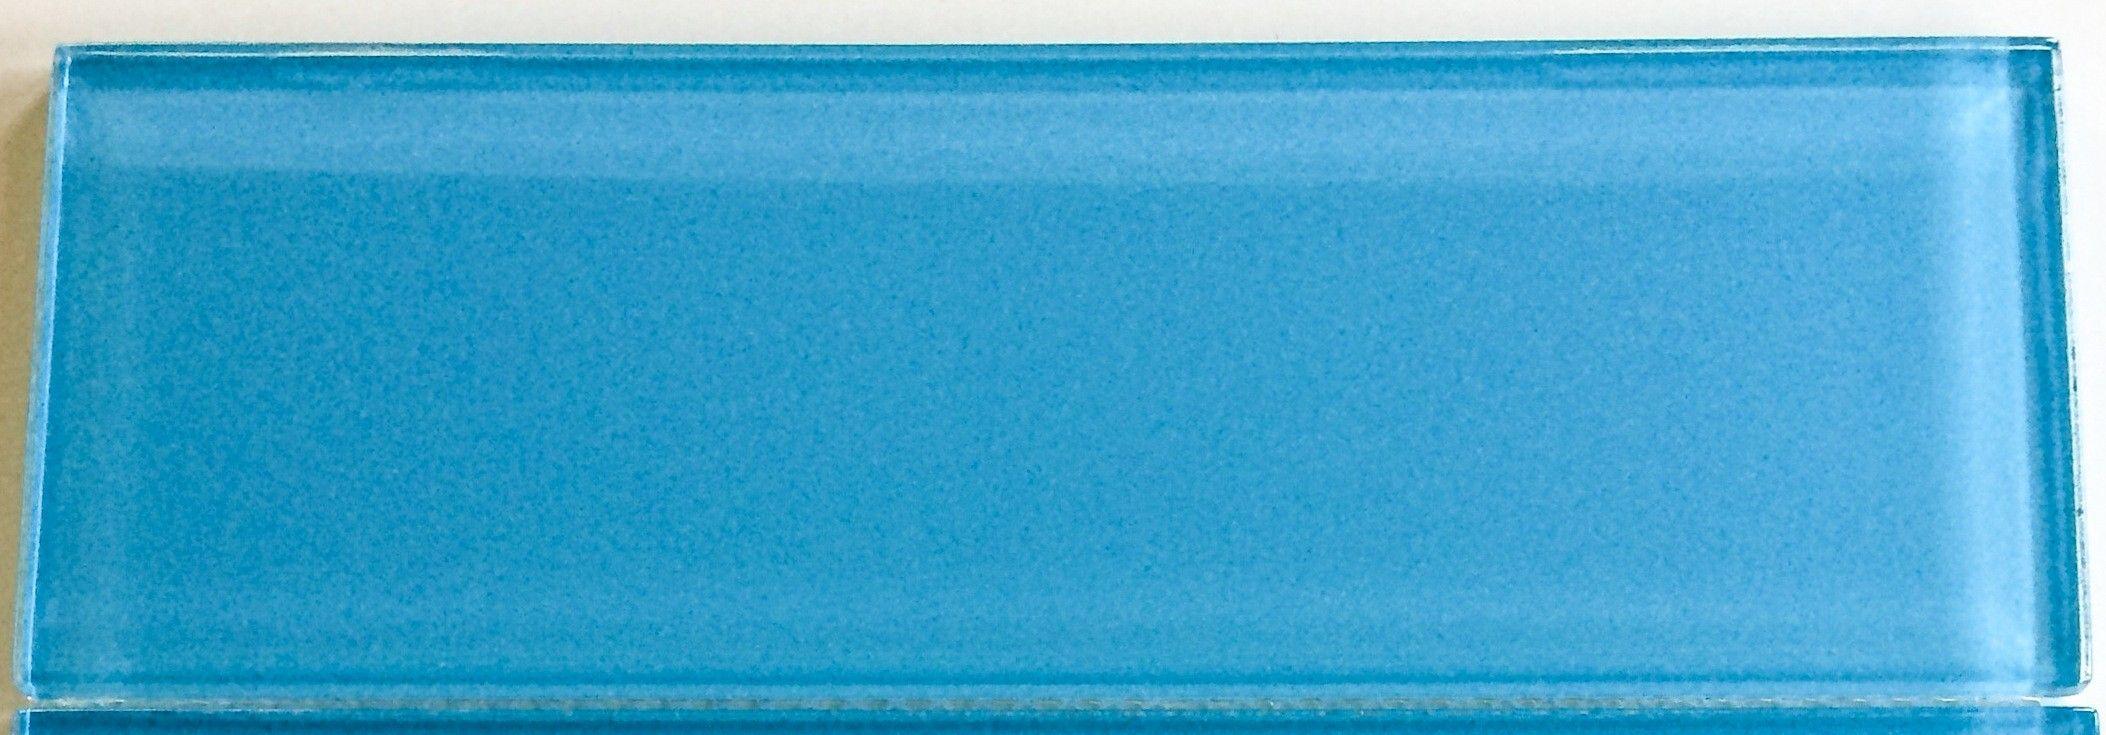 Sample Lush Sky - 4x12 Glass Subway Tile | Subway tiles, Tiled ...